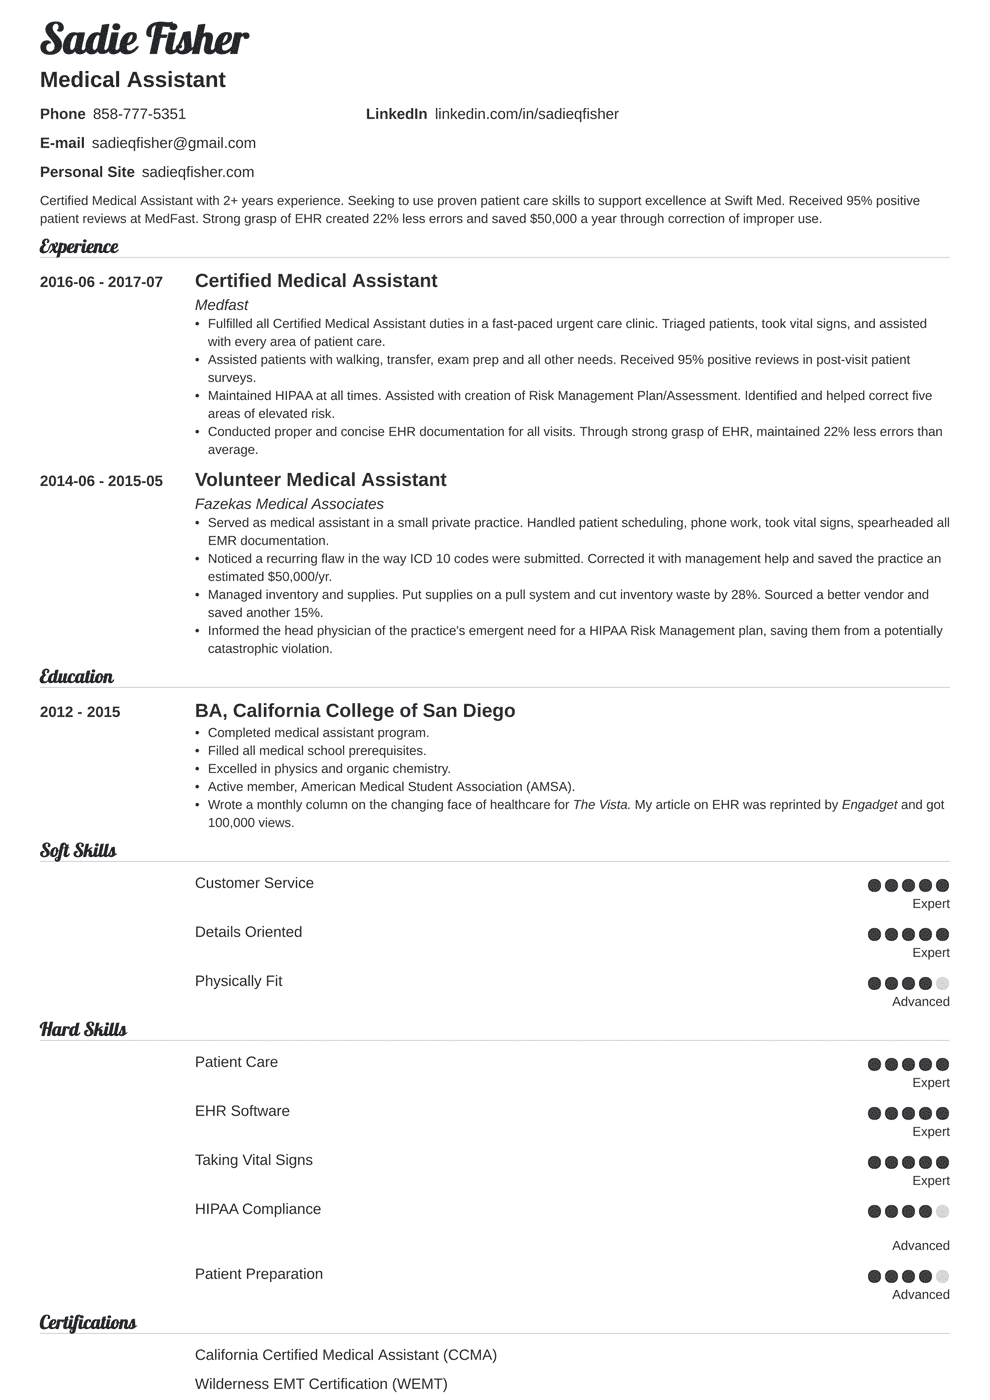 medical assistant resume template valera in 2020 Medical